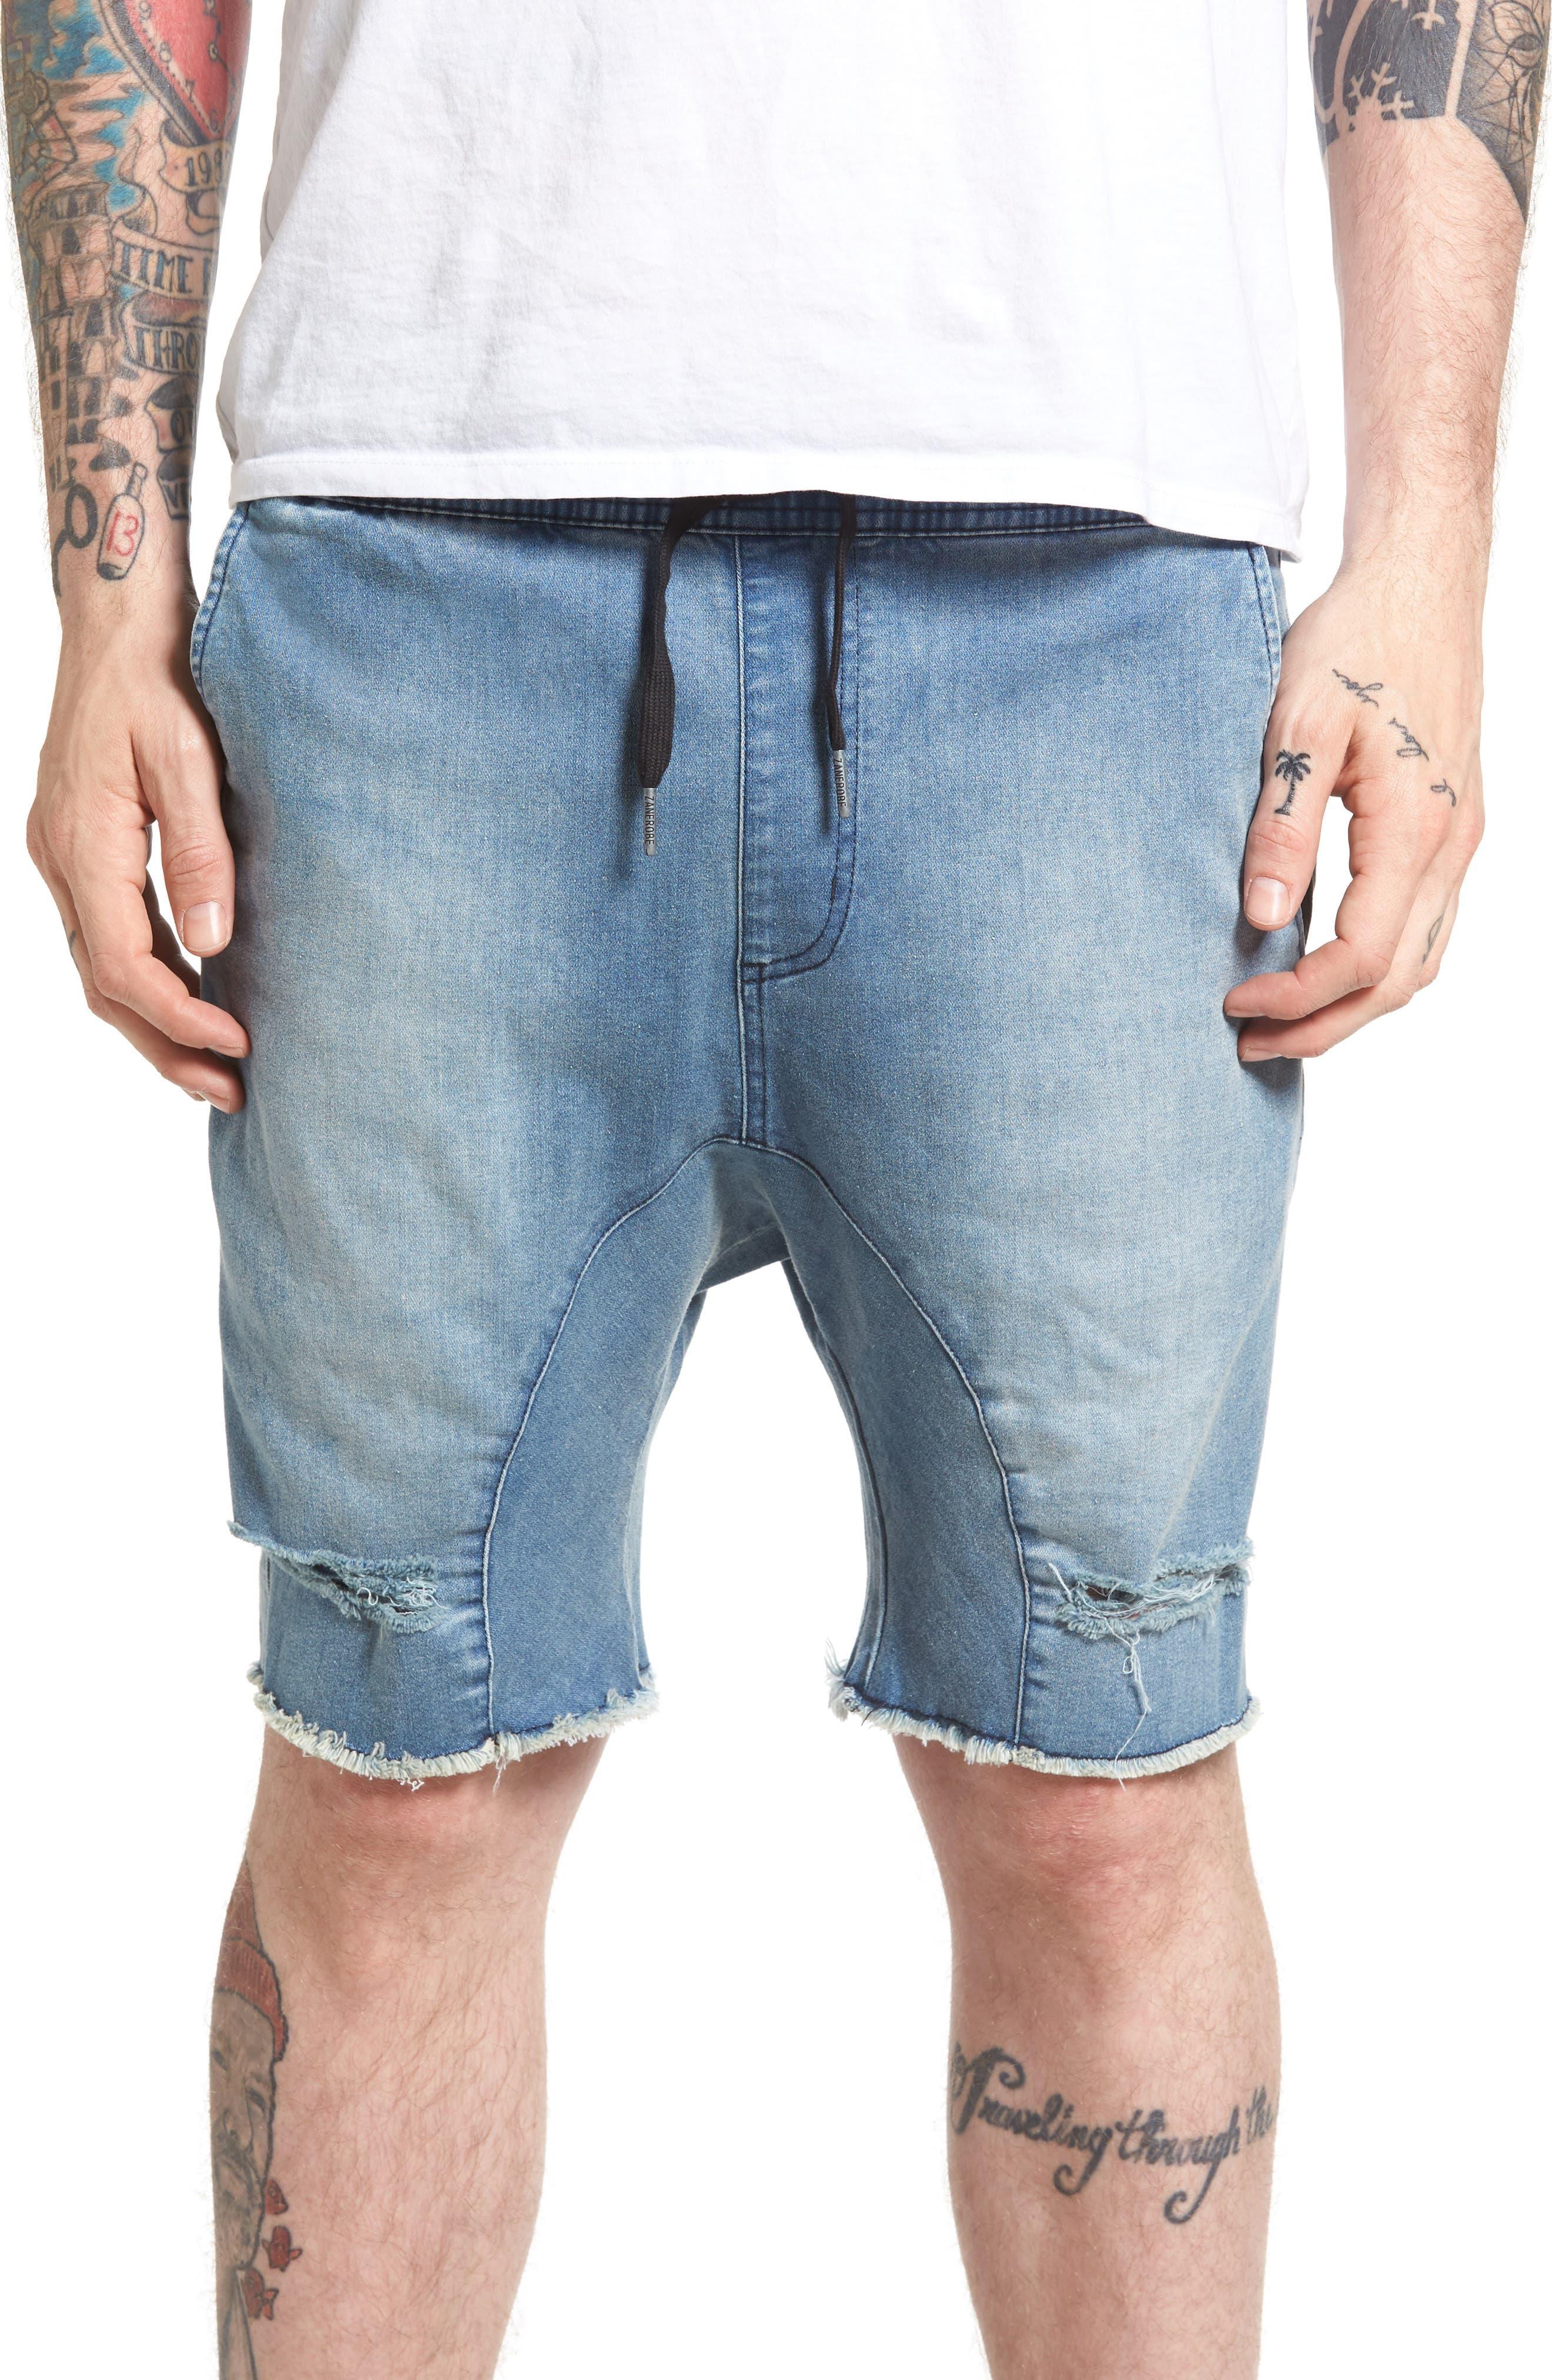 Sureshot Denim Shorts,                         Main,                         color, 430